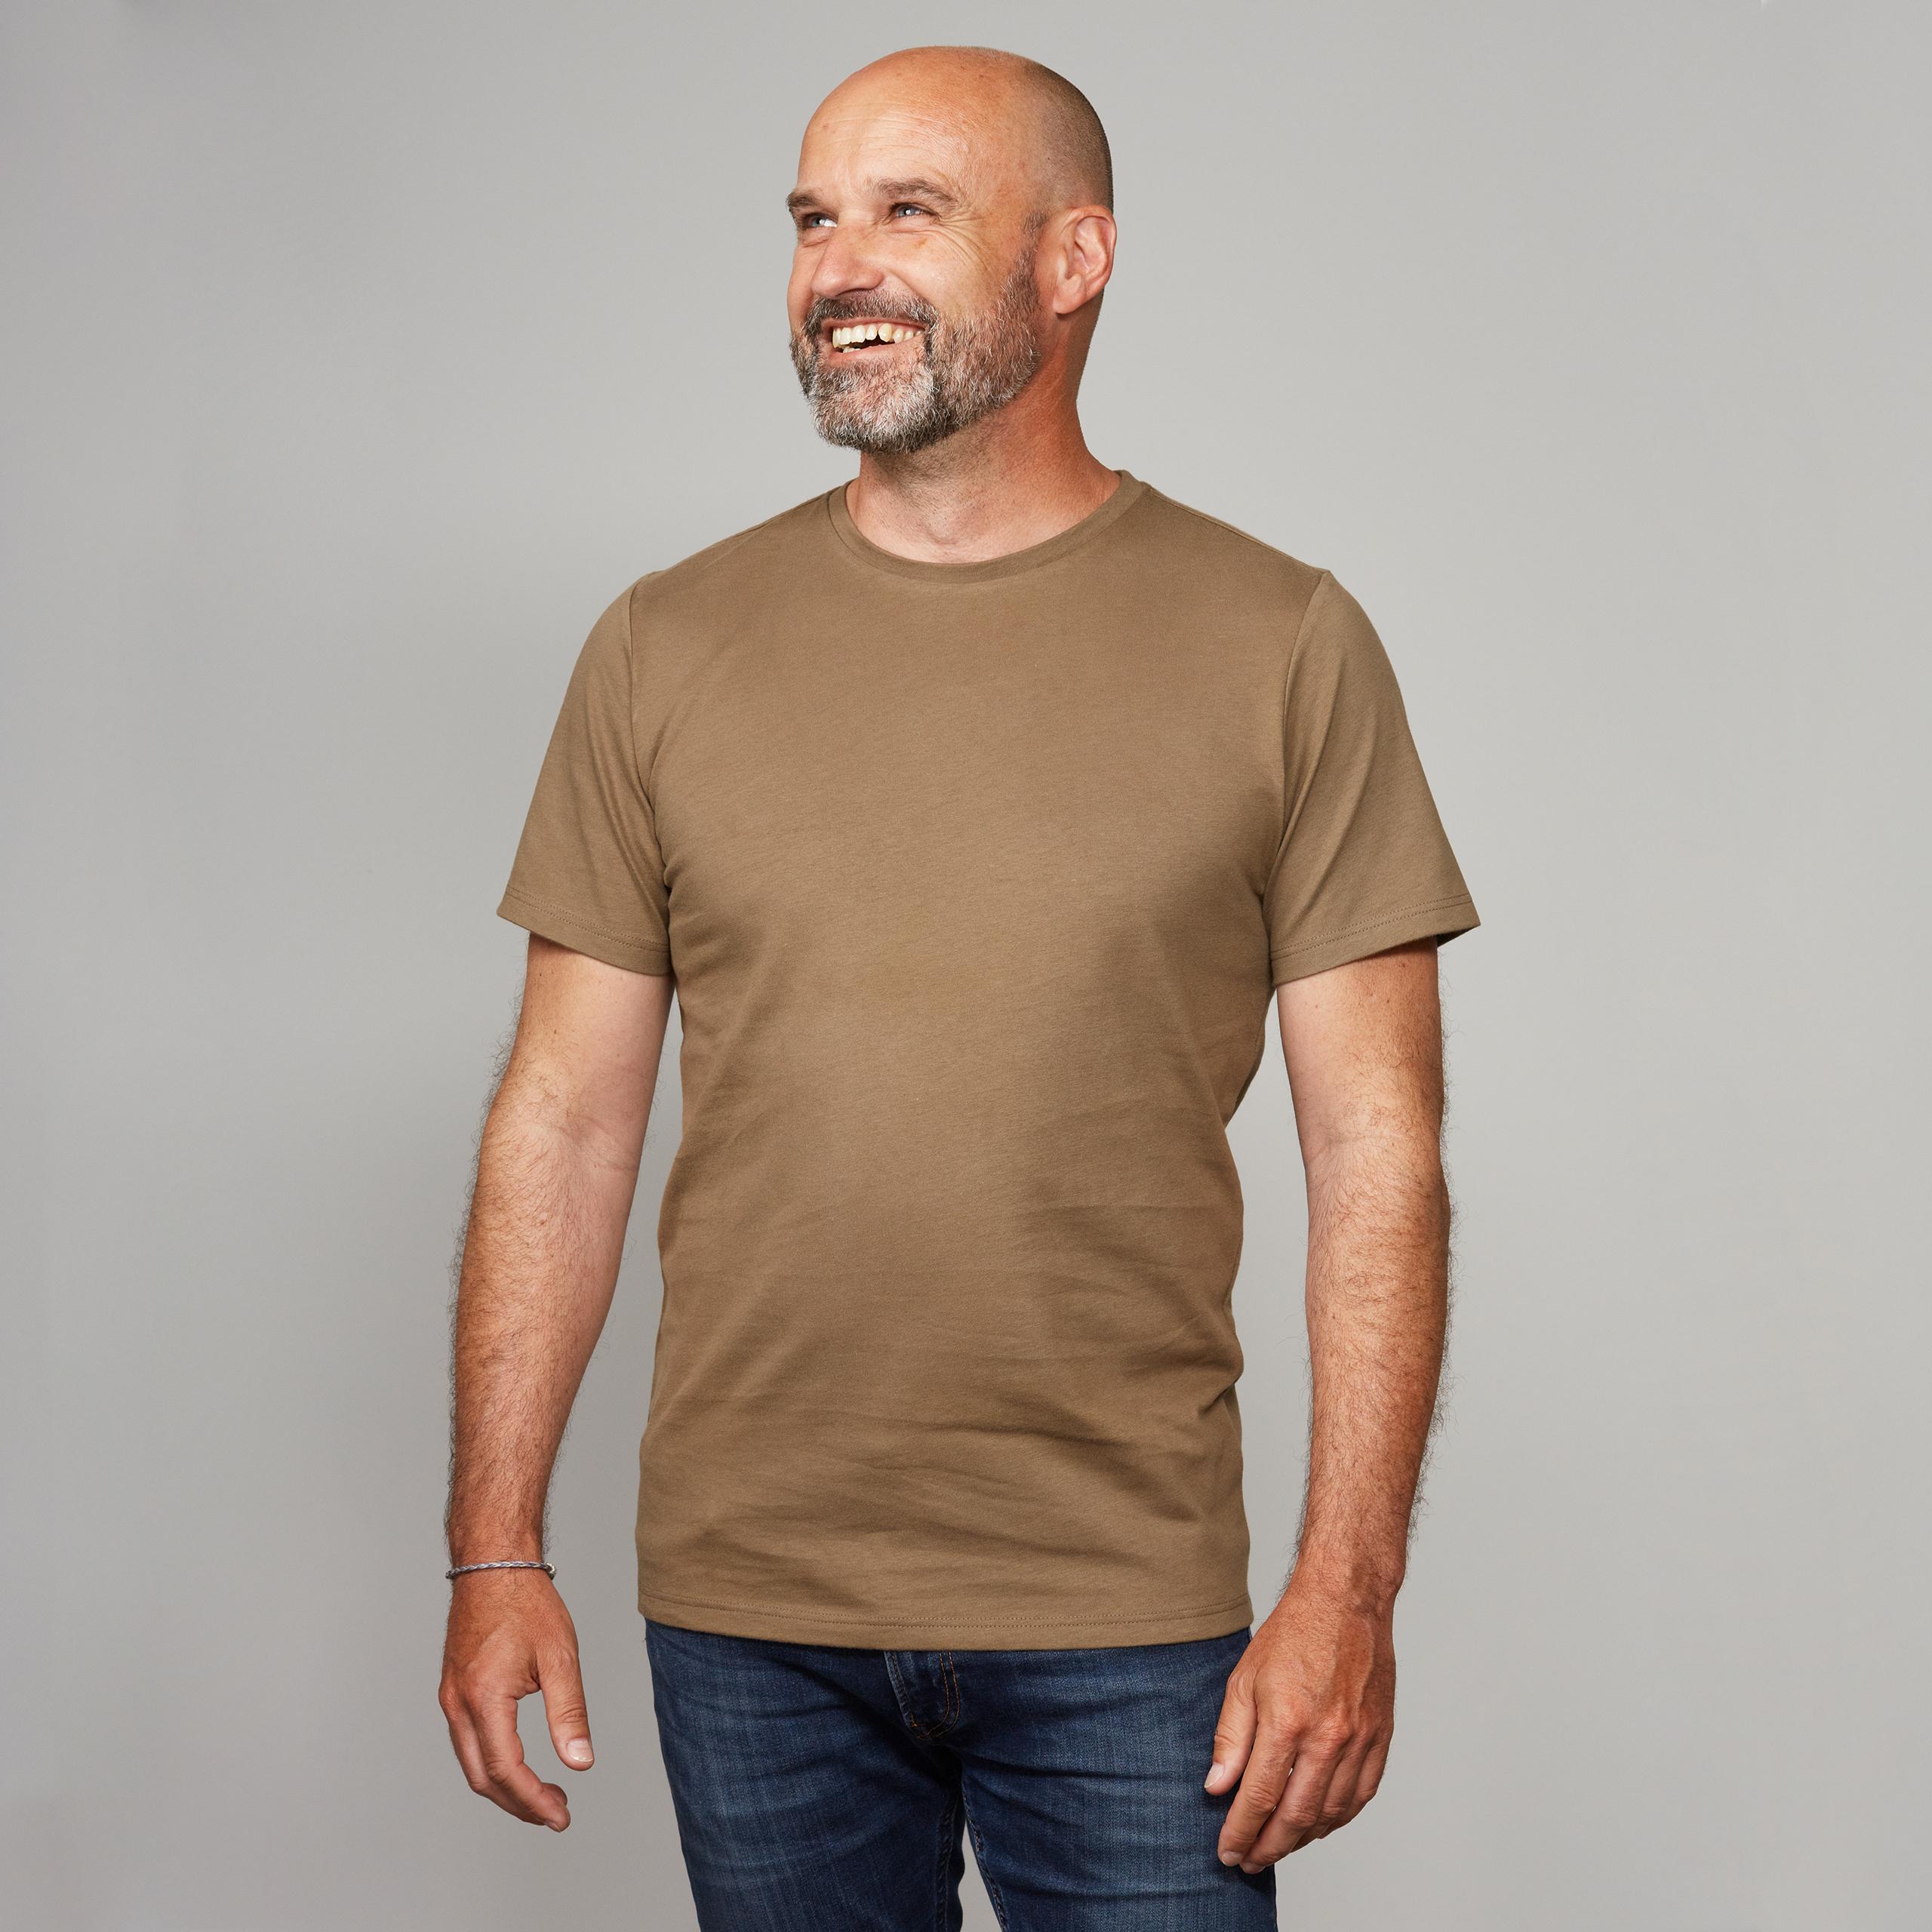 Herren Basic T Shirt Kurzarm steinnuss